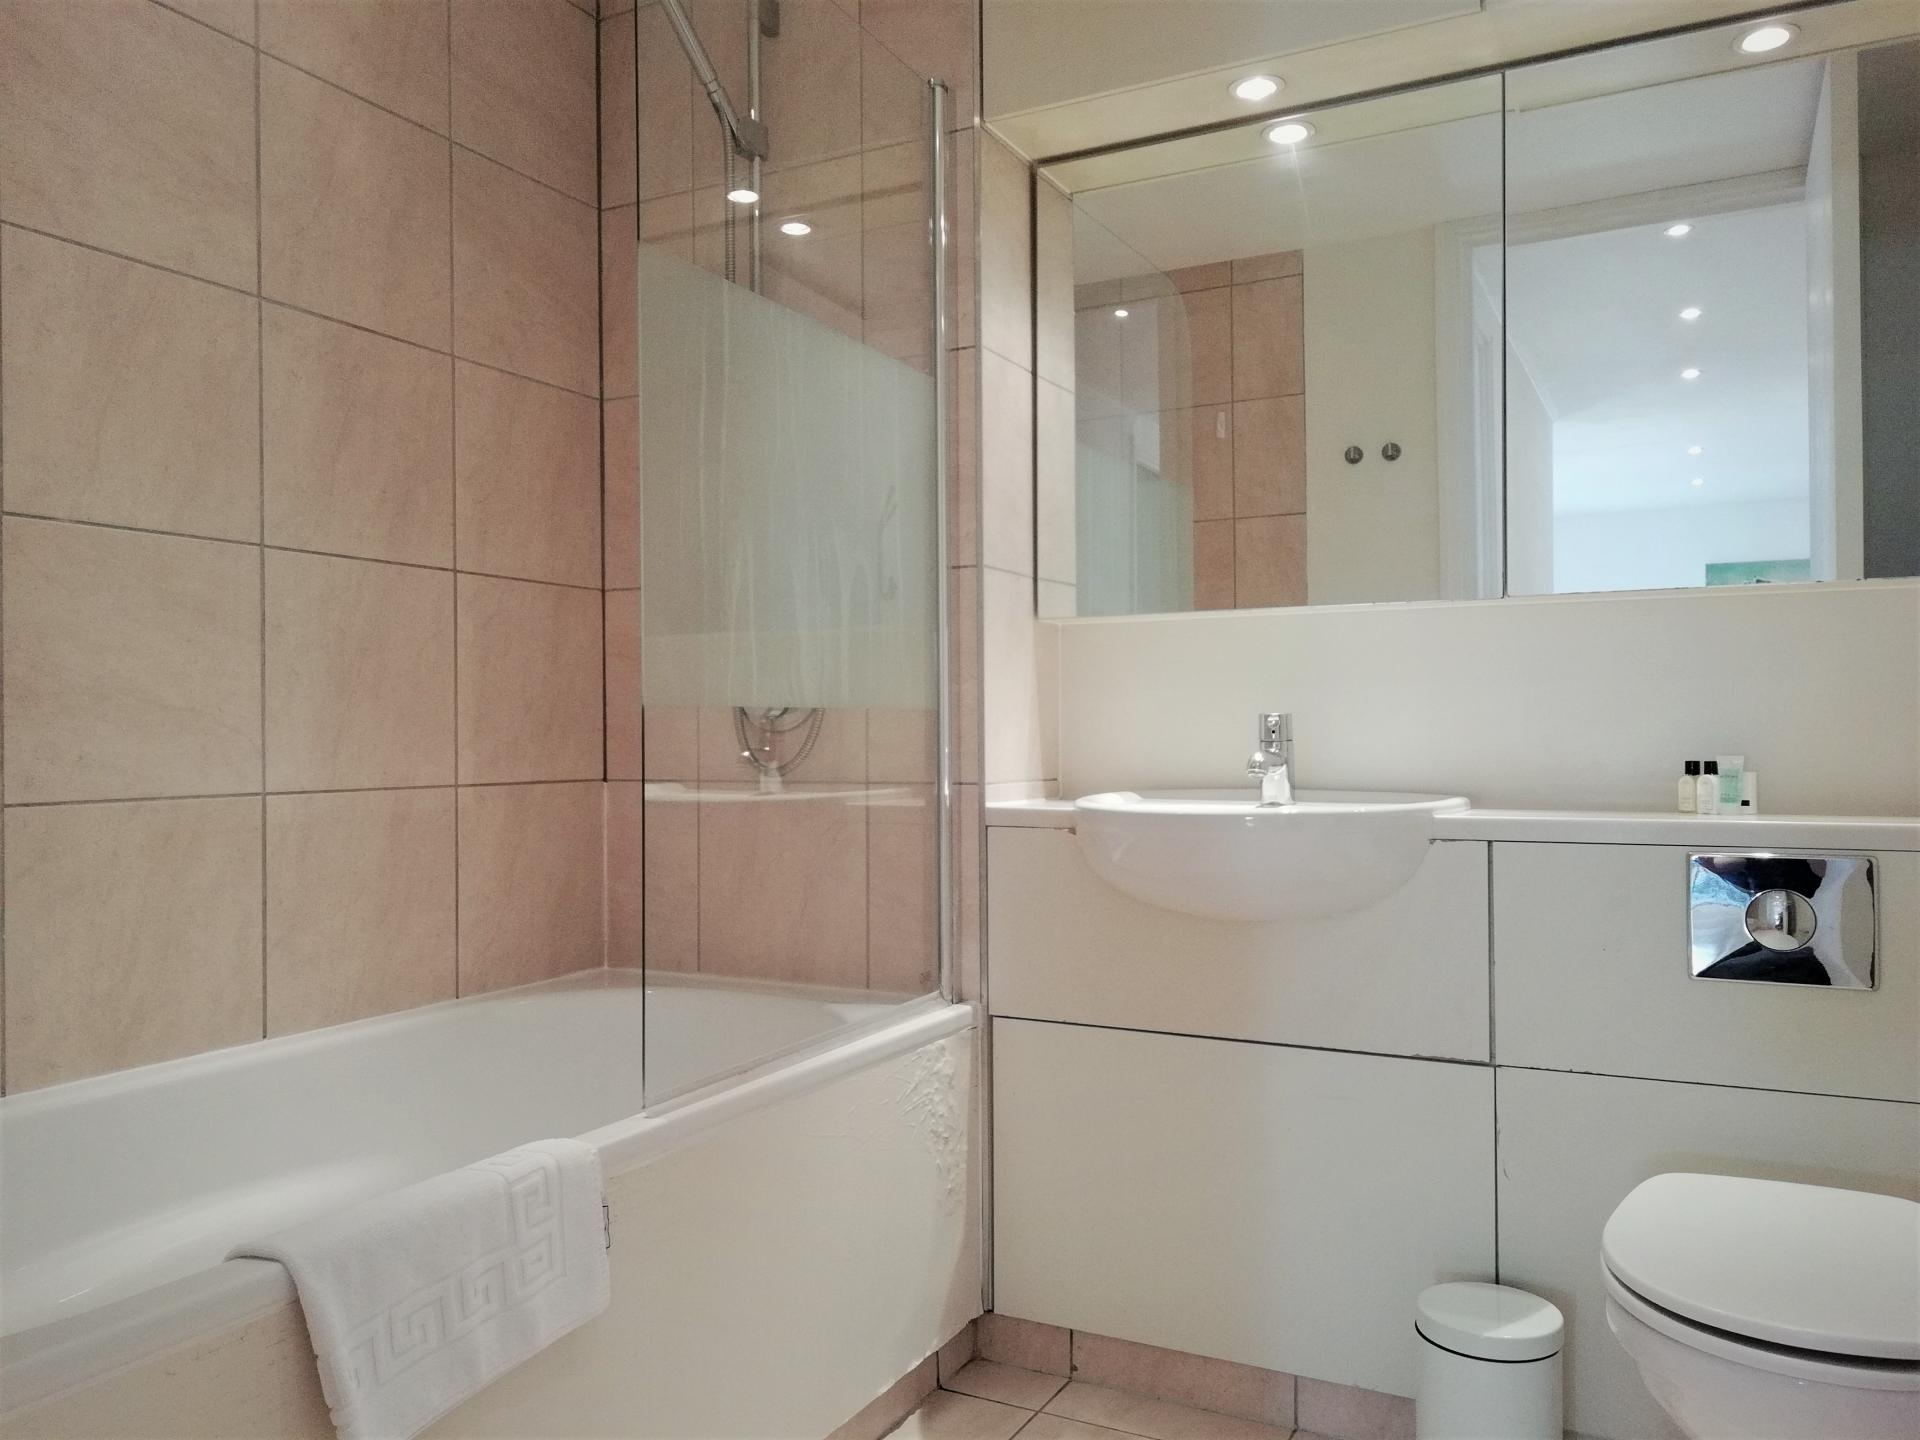 Bathroom at Still Life St Paul's Executive, Farringdon, London - Citybase Apartments